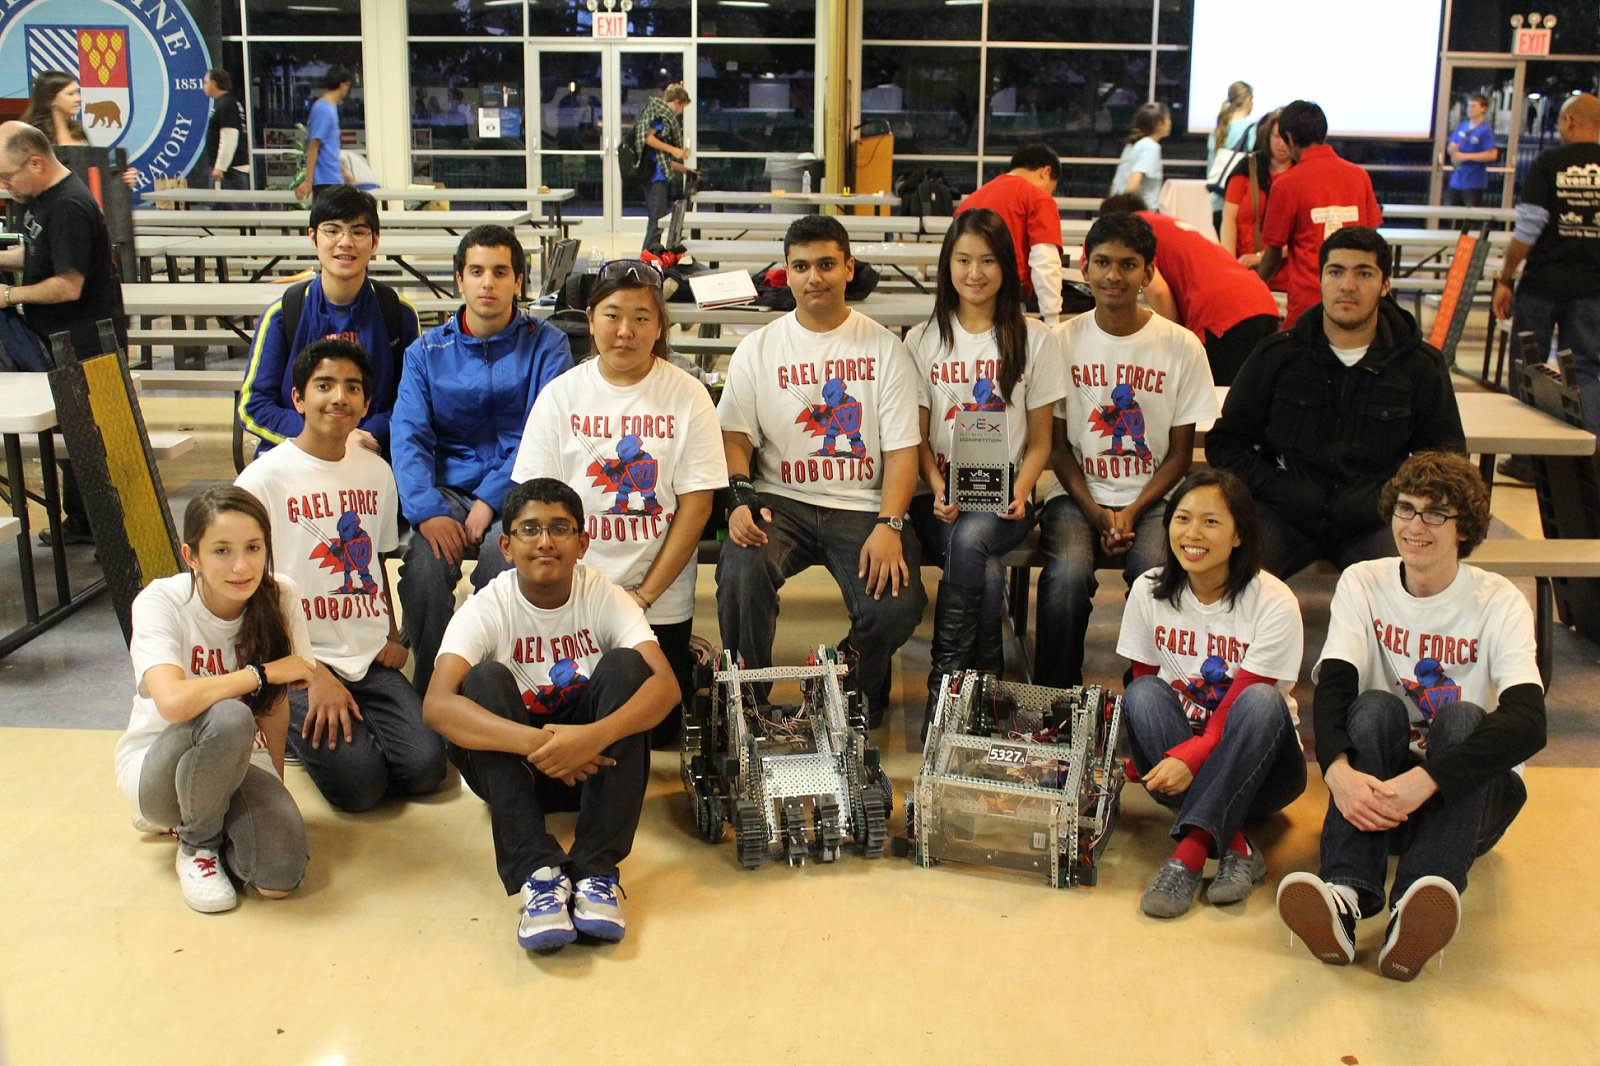 Dublin High School Robotics Team Win Qualifies For 2013 Vex World